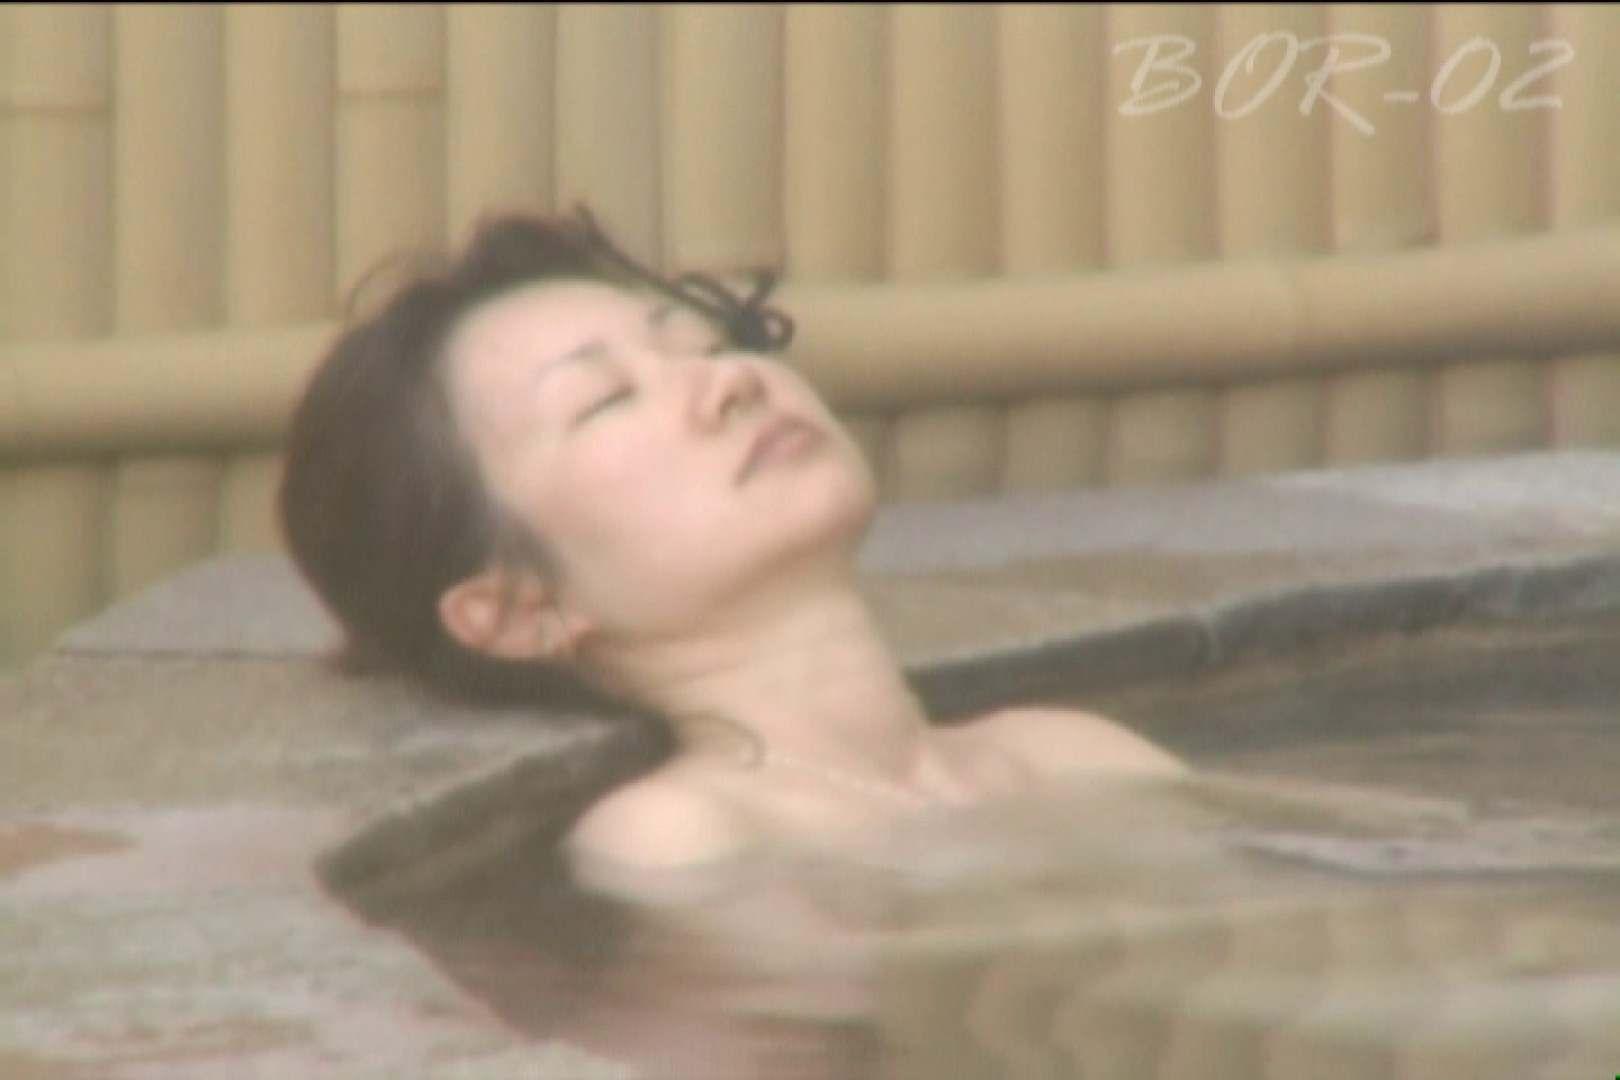 Aquaな露天風呂Vol.477 OLセックス 盗撮われめAV動画紹介 86画像 56